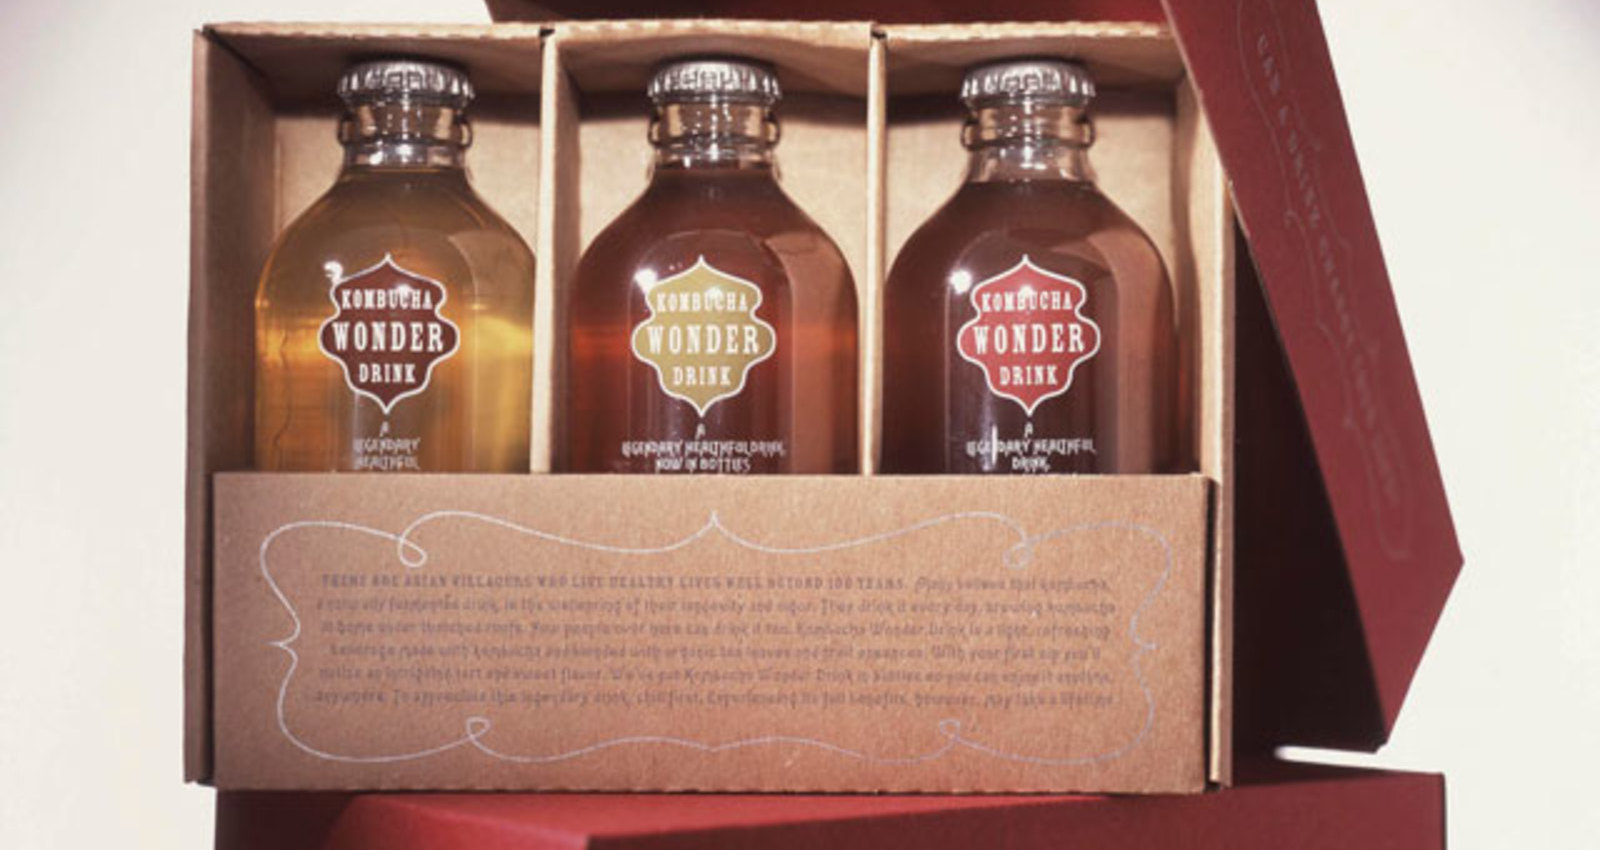 Kombucha Wonder Drink Holiday Gift Box